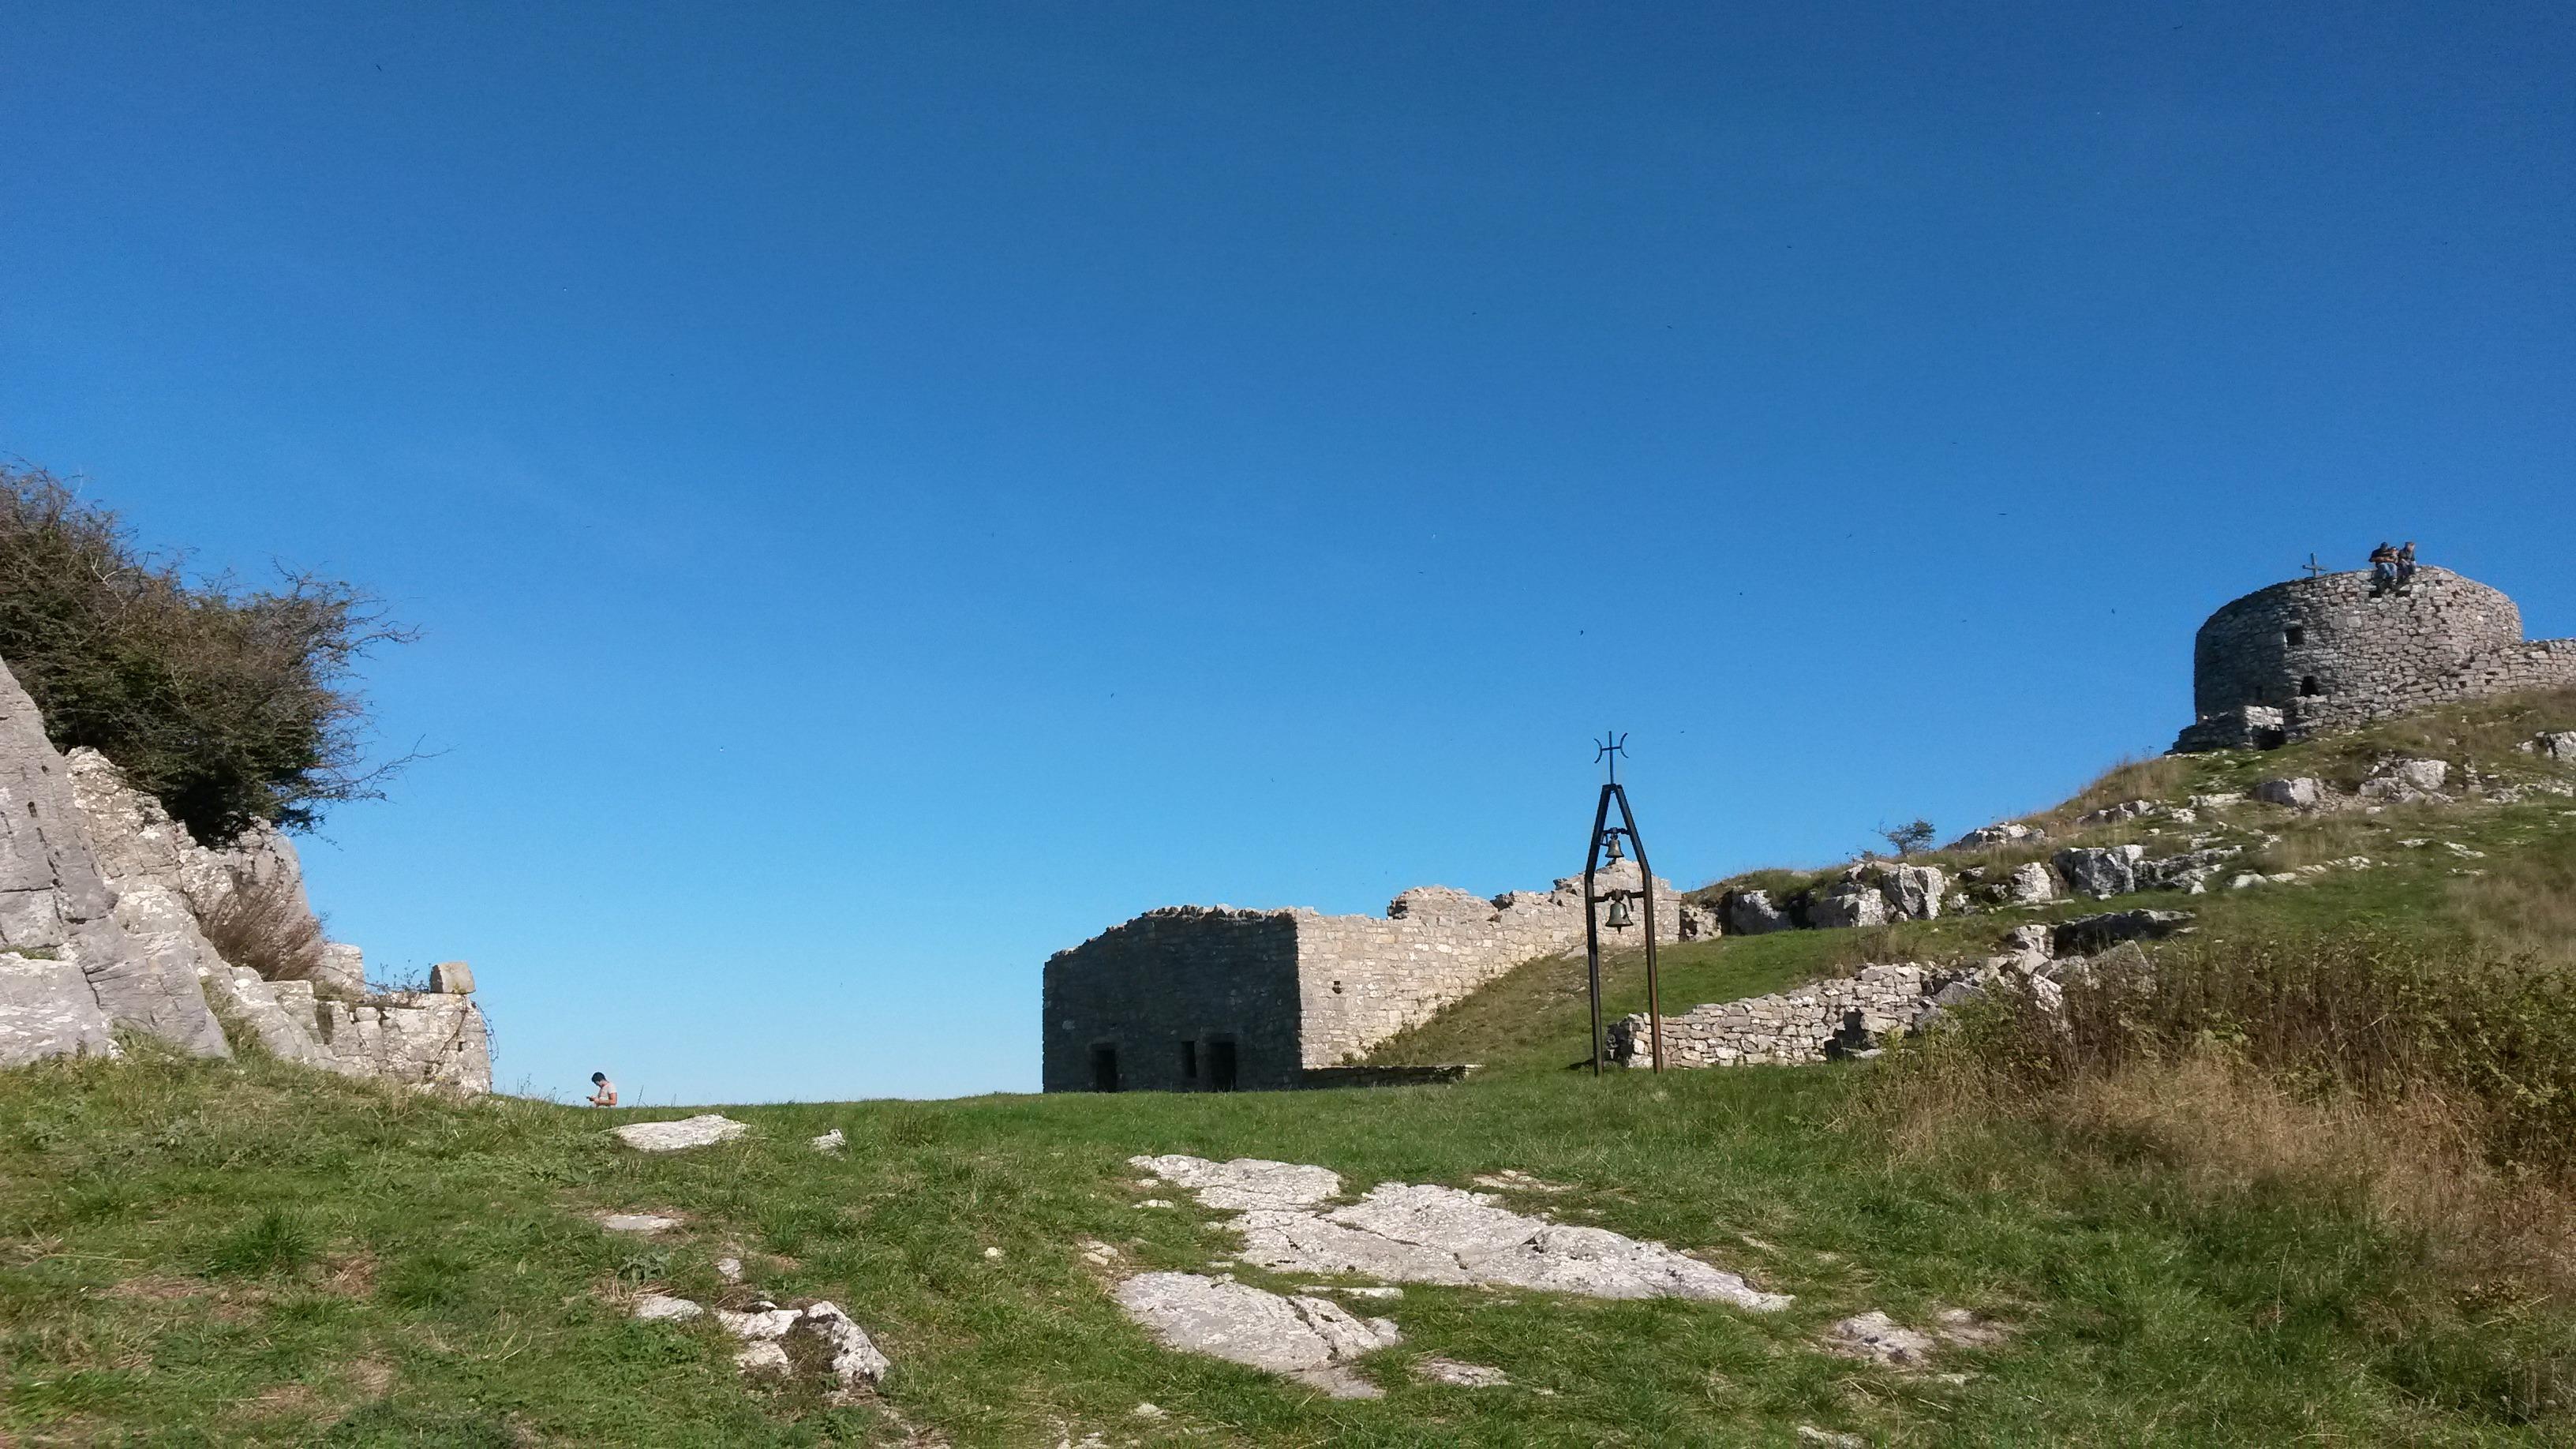 [cml_media_alt id='6910']Monte Labbro - Natale in Toscana[/cml_media_alt]